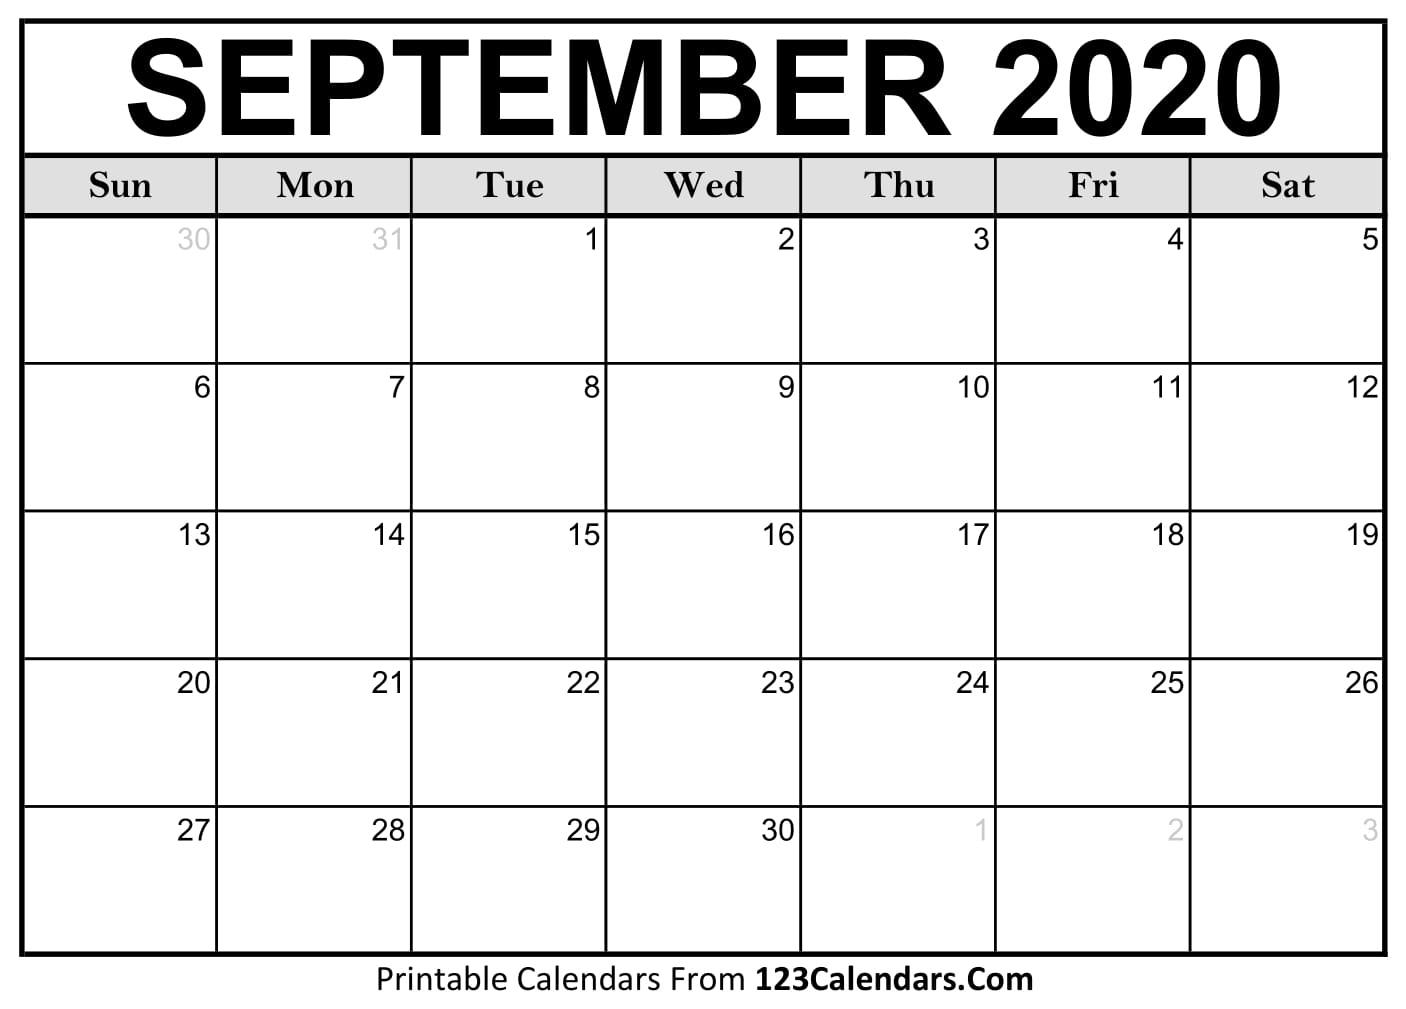 September 2020 Printable Calendar | 123Calendars with Calender August And September 2020